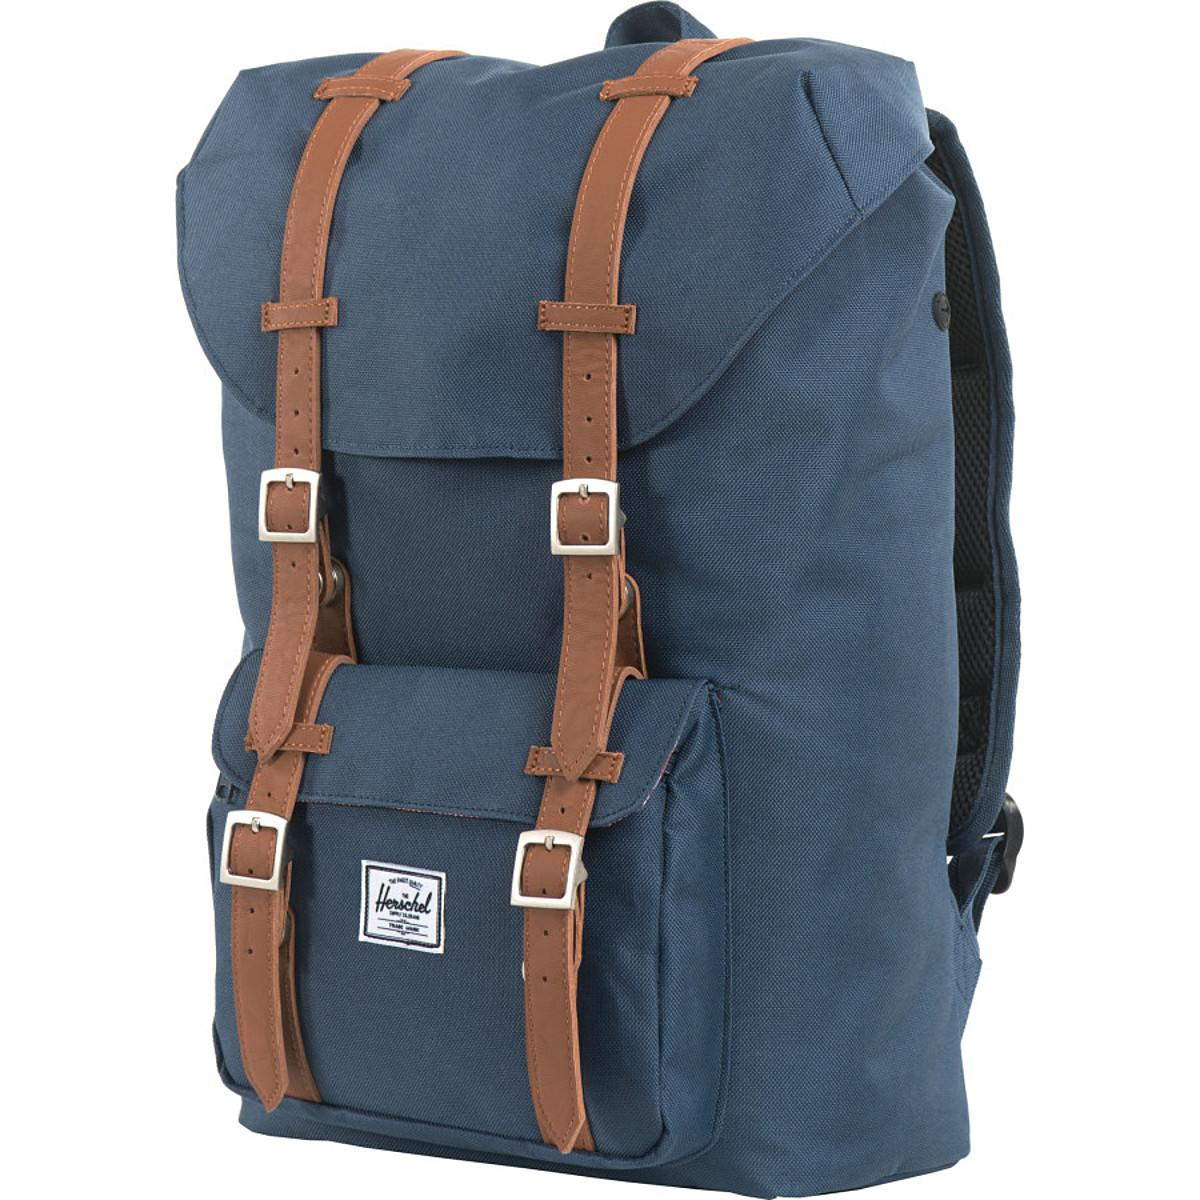 Lyst - Herschel Supply Co. Little America Backpack Navy in Blue for Men - Save 18.85245901639344%